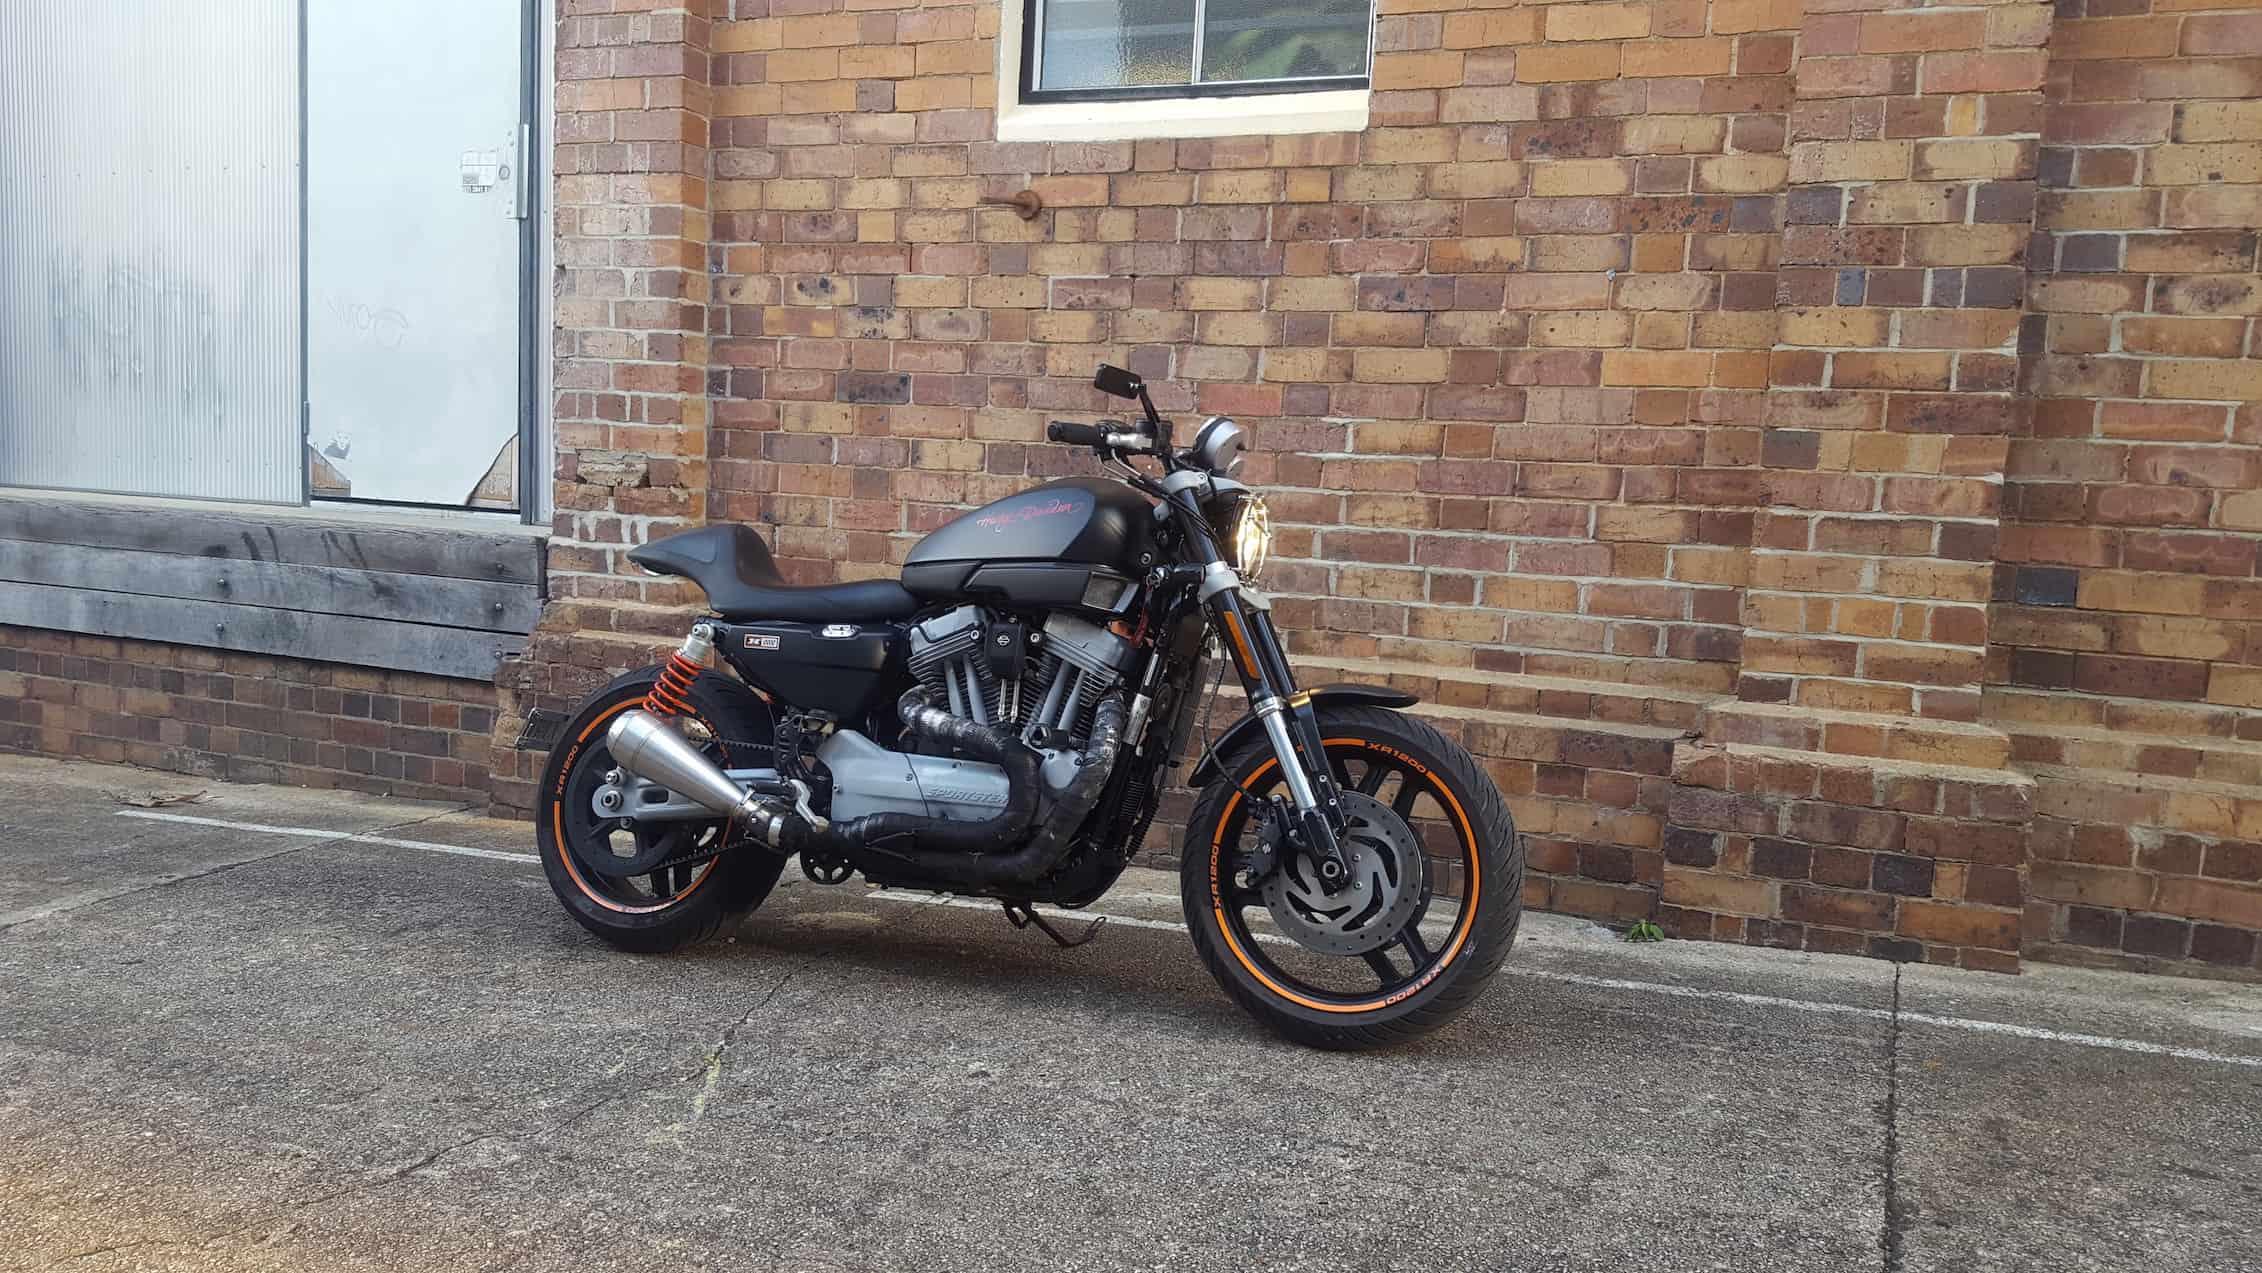 Harley Davidson '08 XR1200